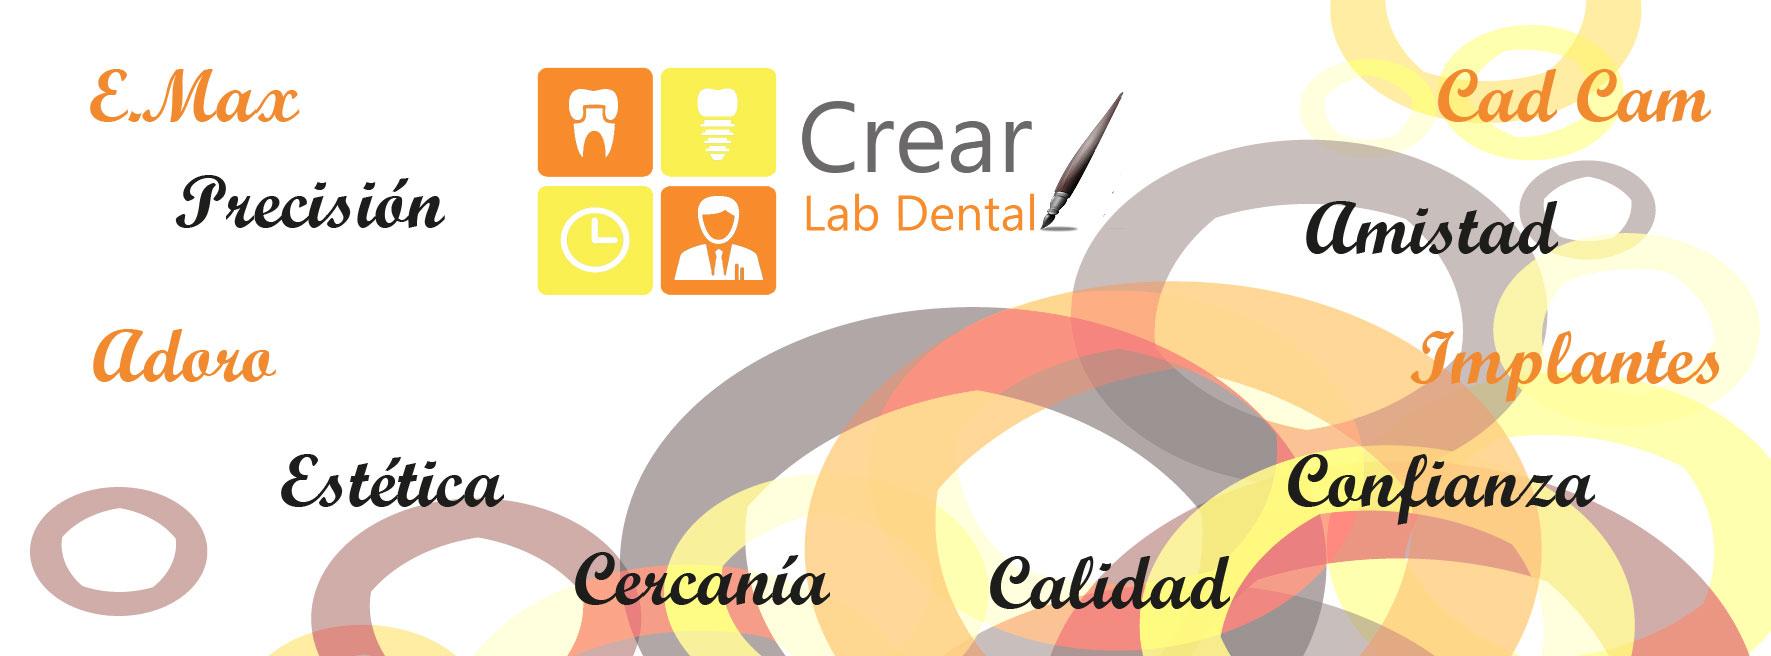 crearlab